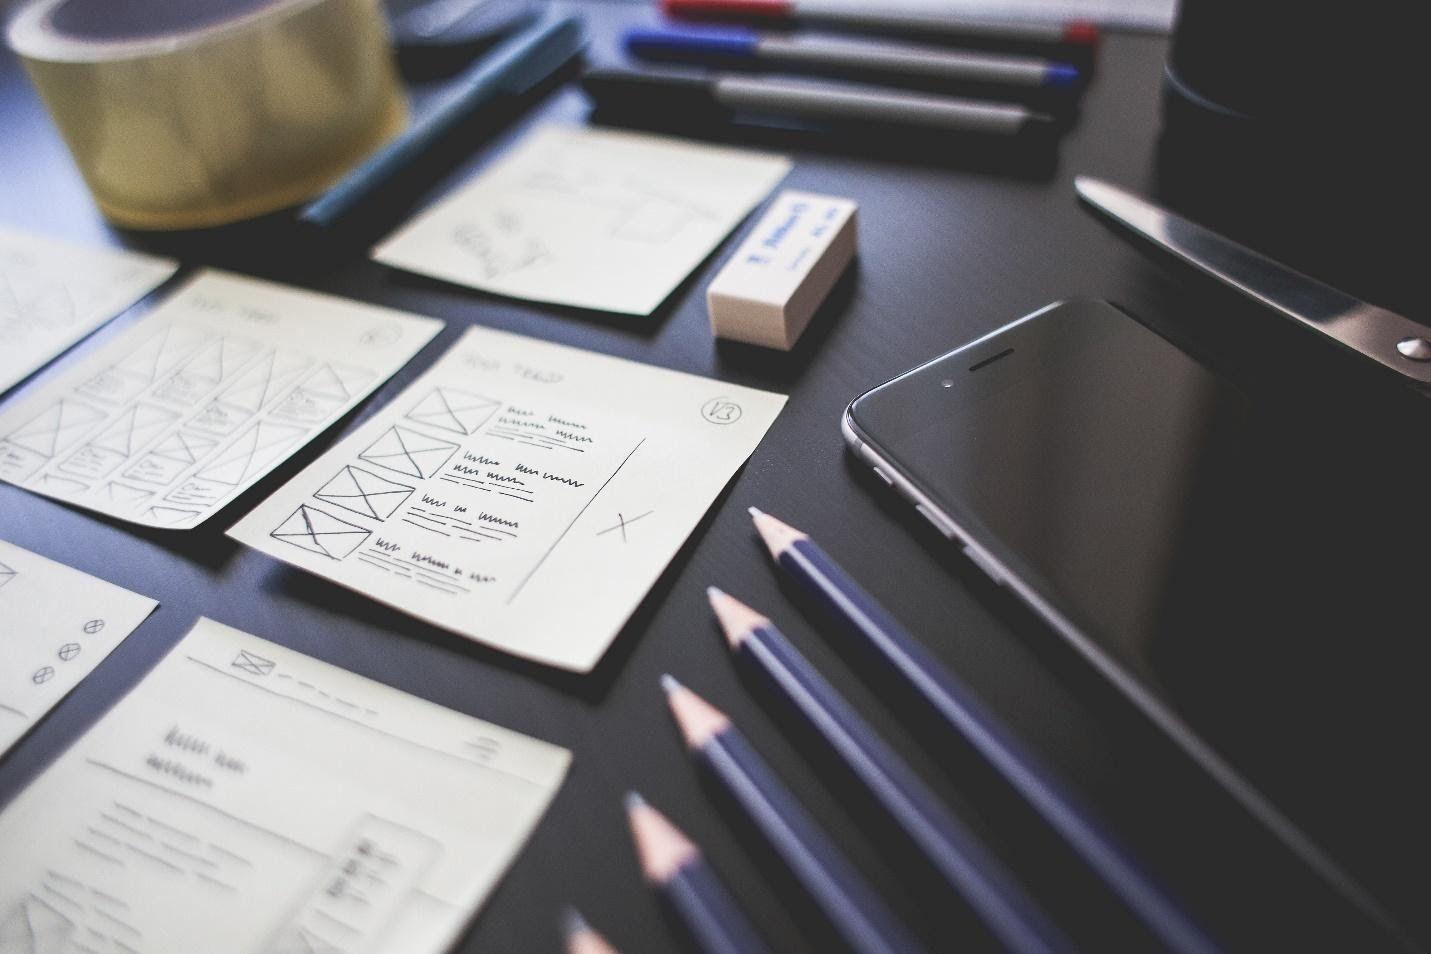 design prototype with asynchronous feedback